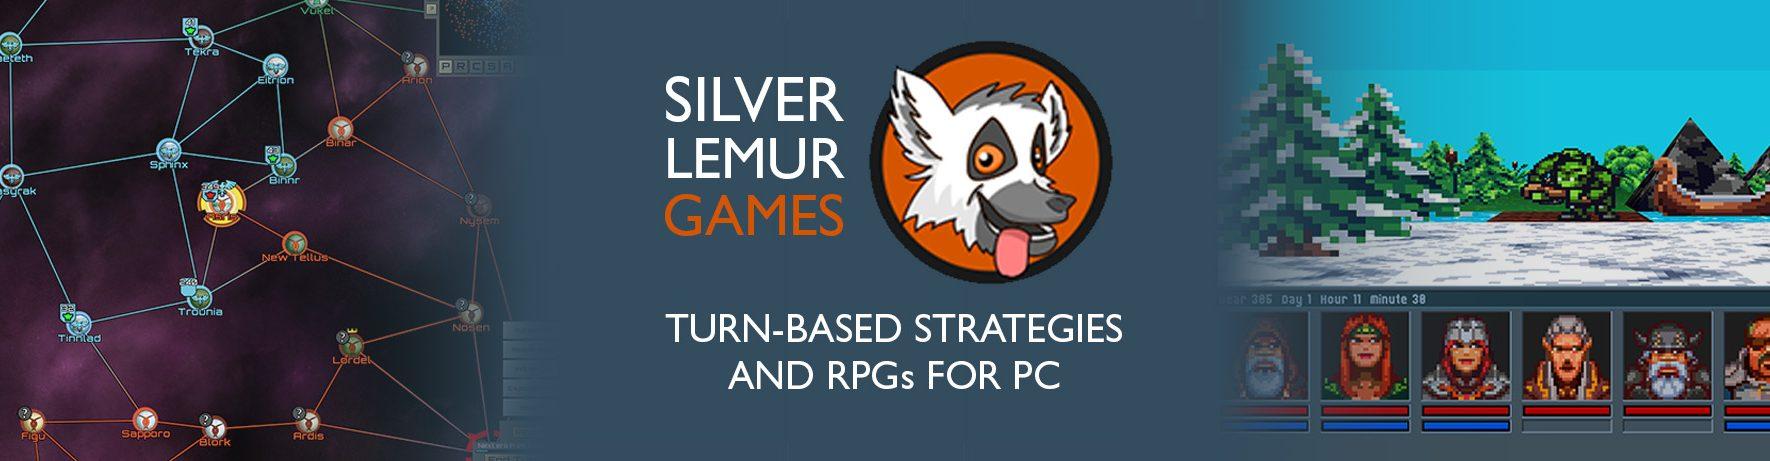 Silver Lemur Games